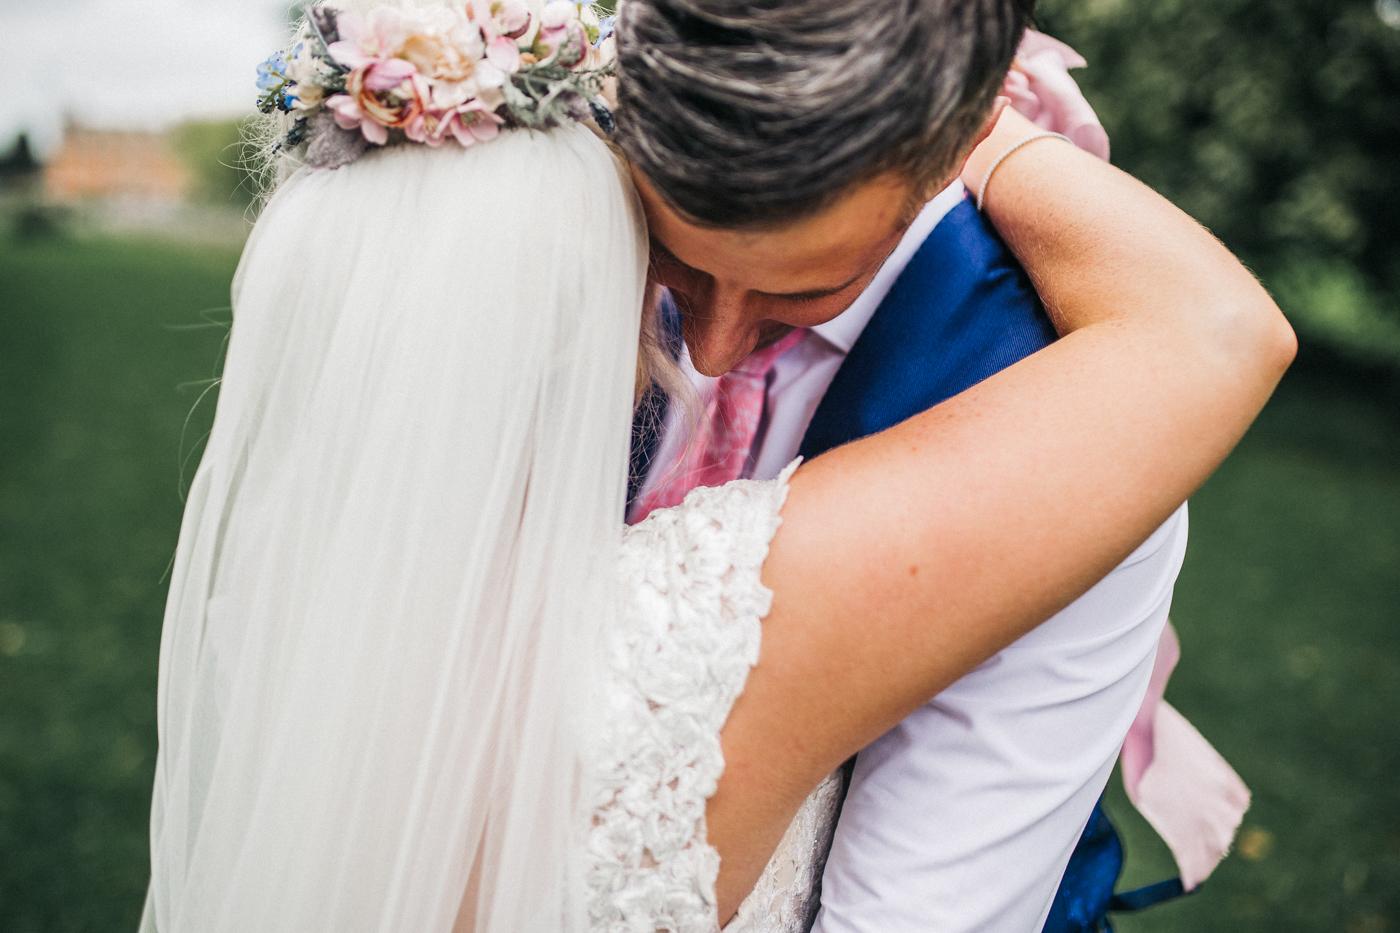 teesside-middlesbrough-north-east-wedding-photographer-creative-wedding-venues-0004.jpg